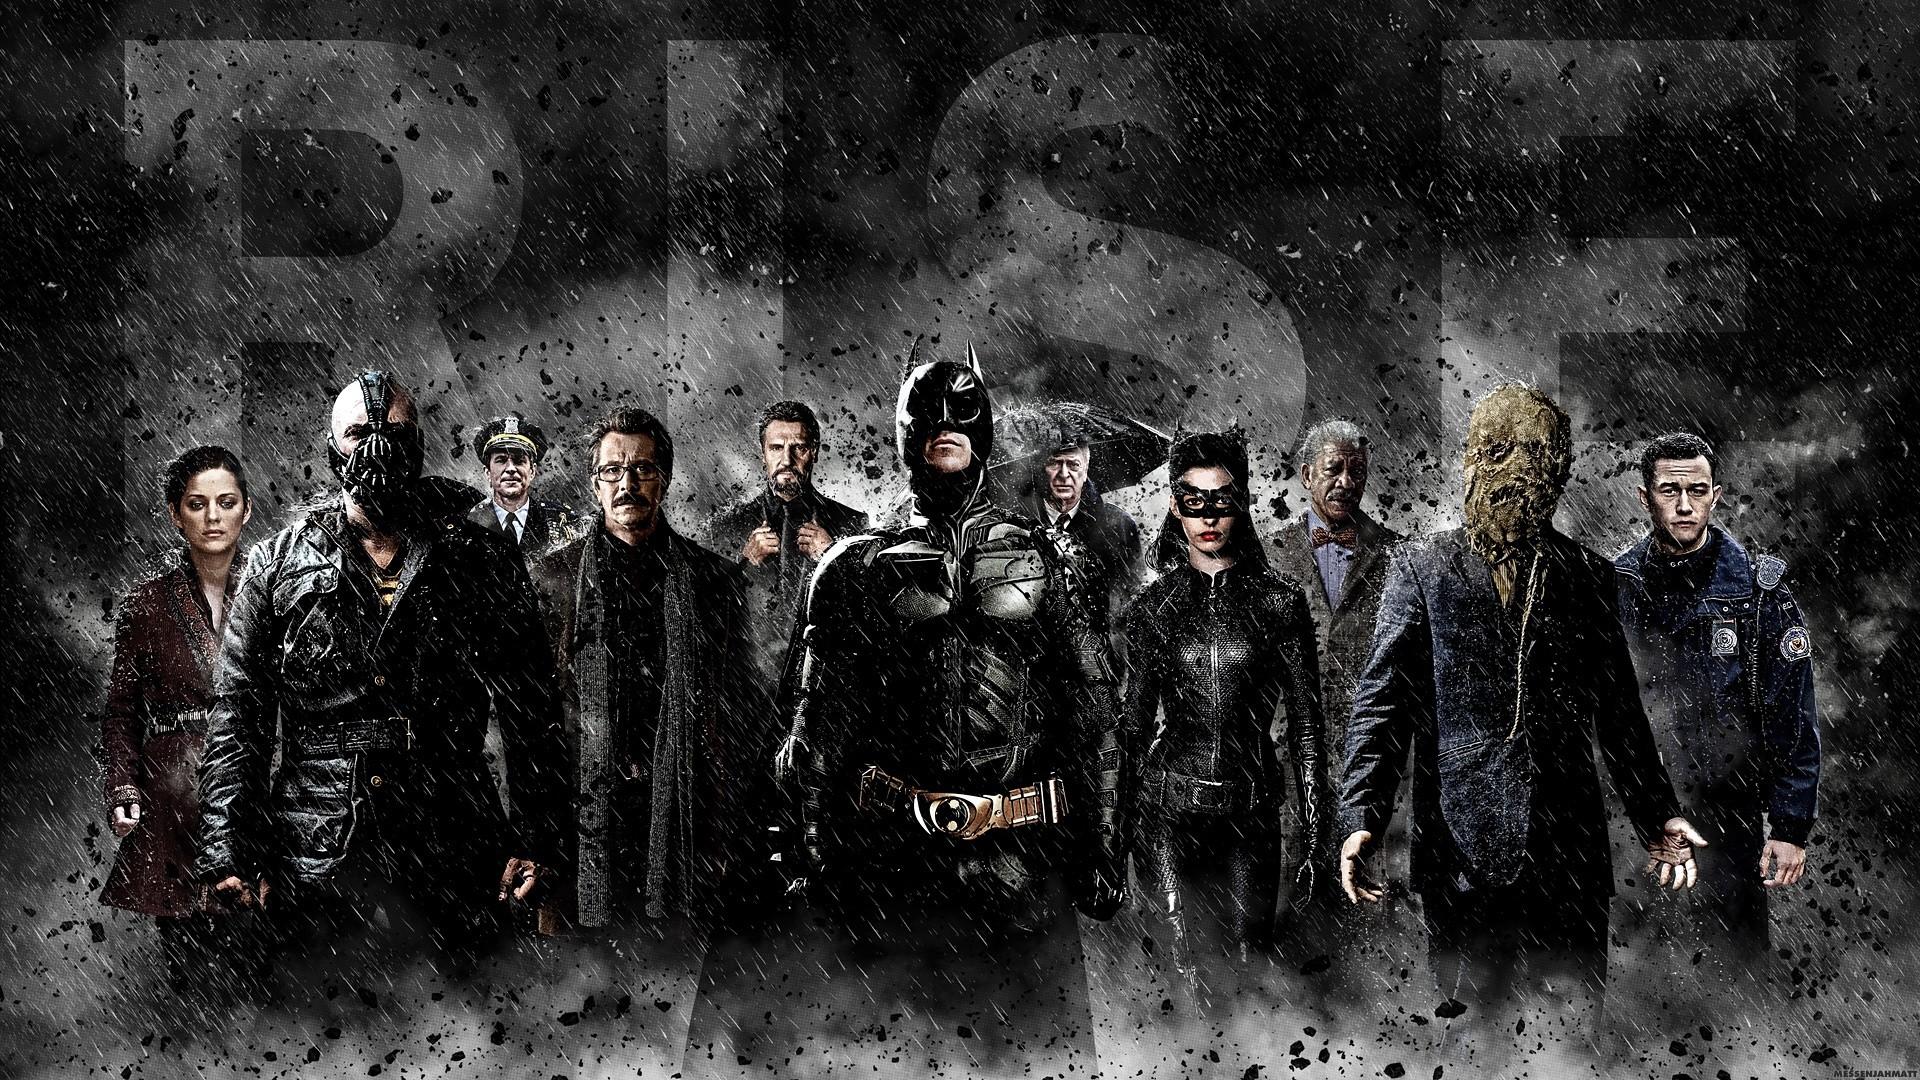 dark-Police-Rain-Catsuits-Glasses-Batman-Bane-Scarecrow-character-Jim-Gordon-People-The-wallpaper-wpc9004037